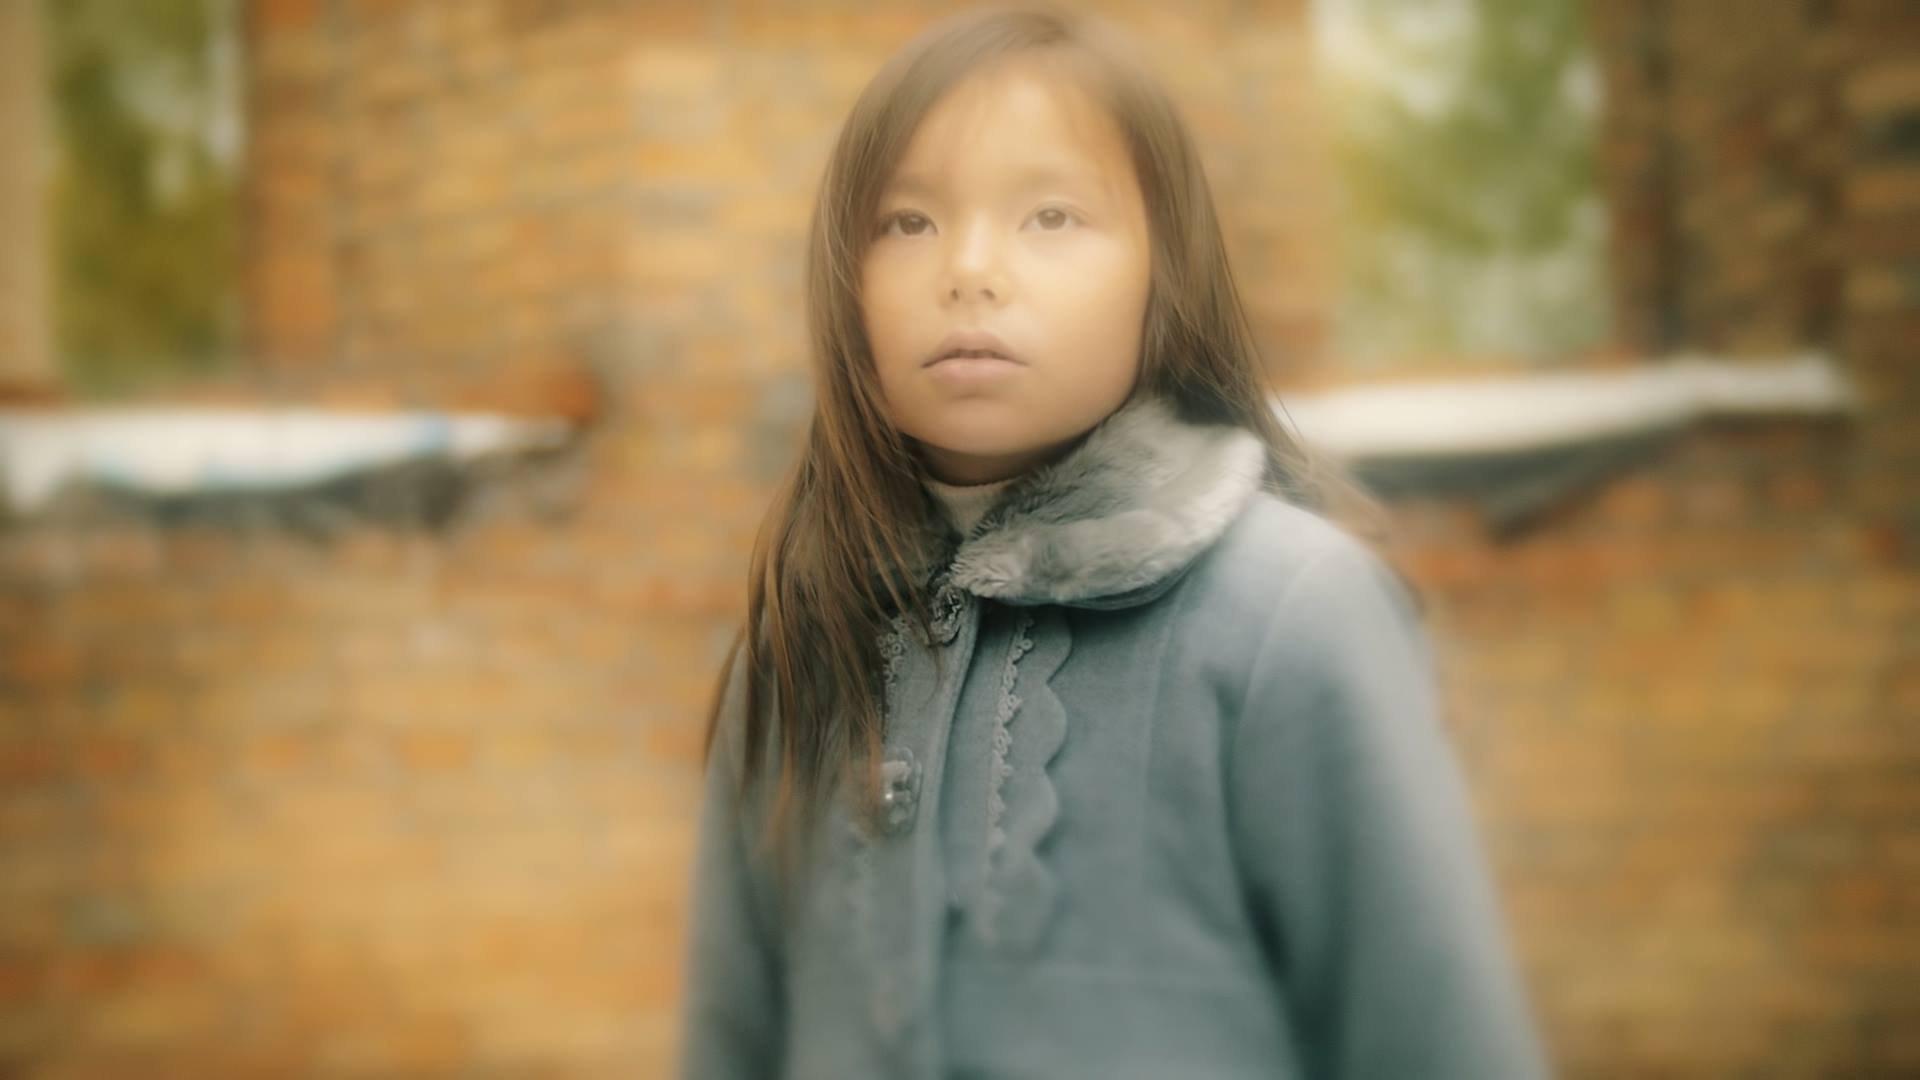 A still from Masaki Inoue's film Reminiscence